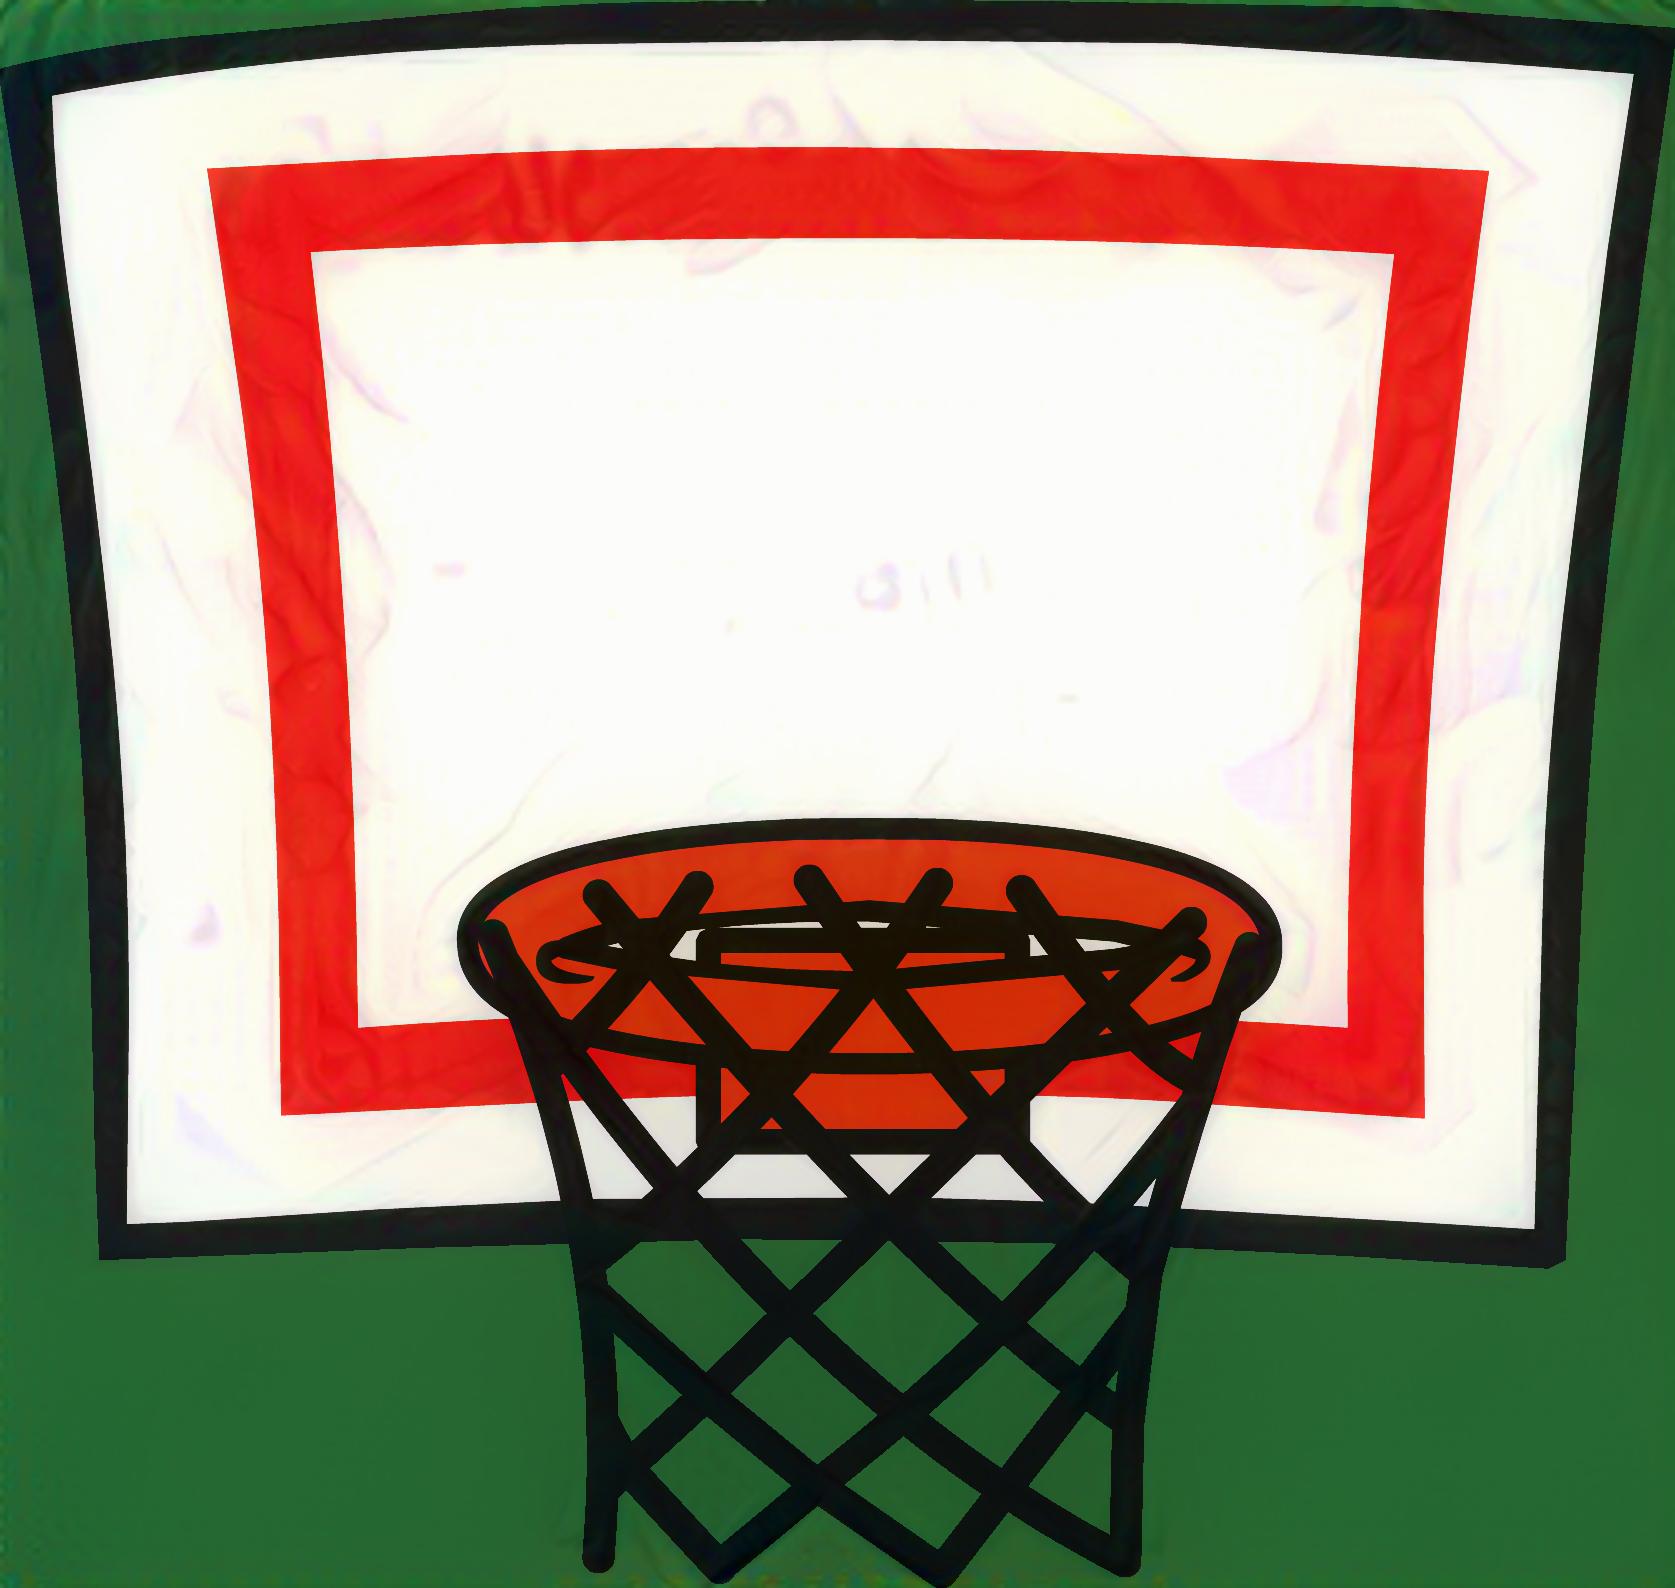 Papua New Guinea national basketball team Backboard Clip art.